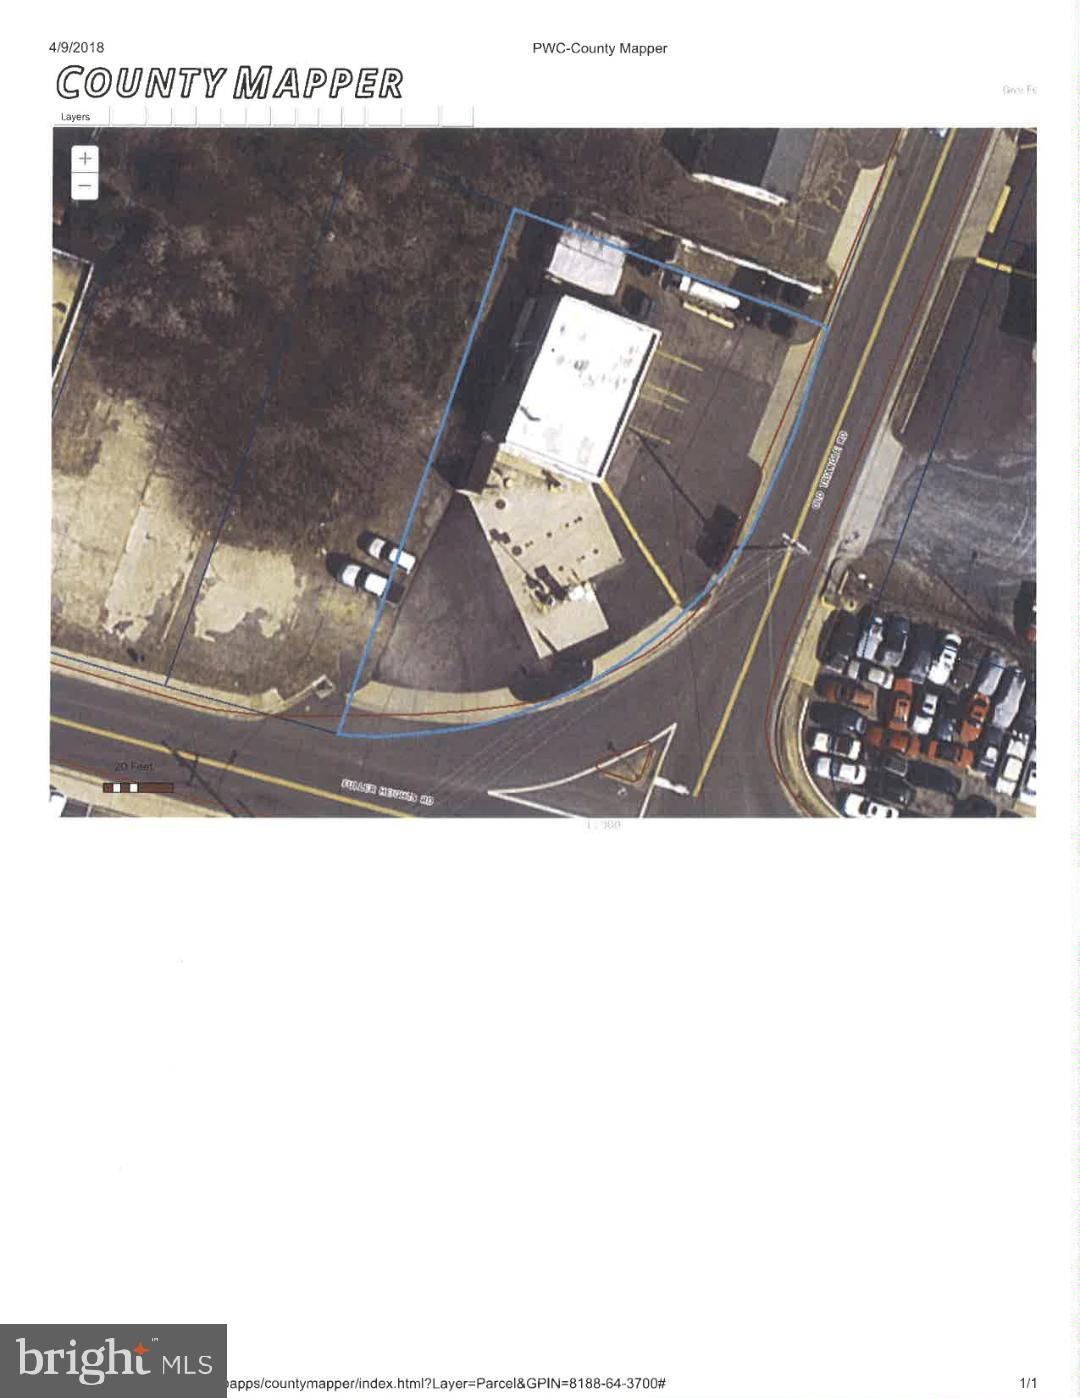 18704 OLD TRIANGLE ROAD, TRIANGLE, VA 22172